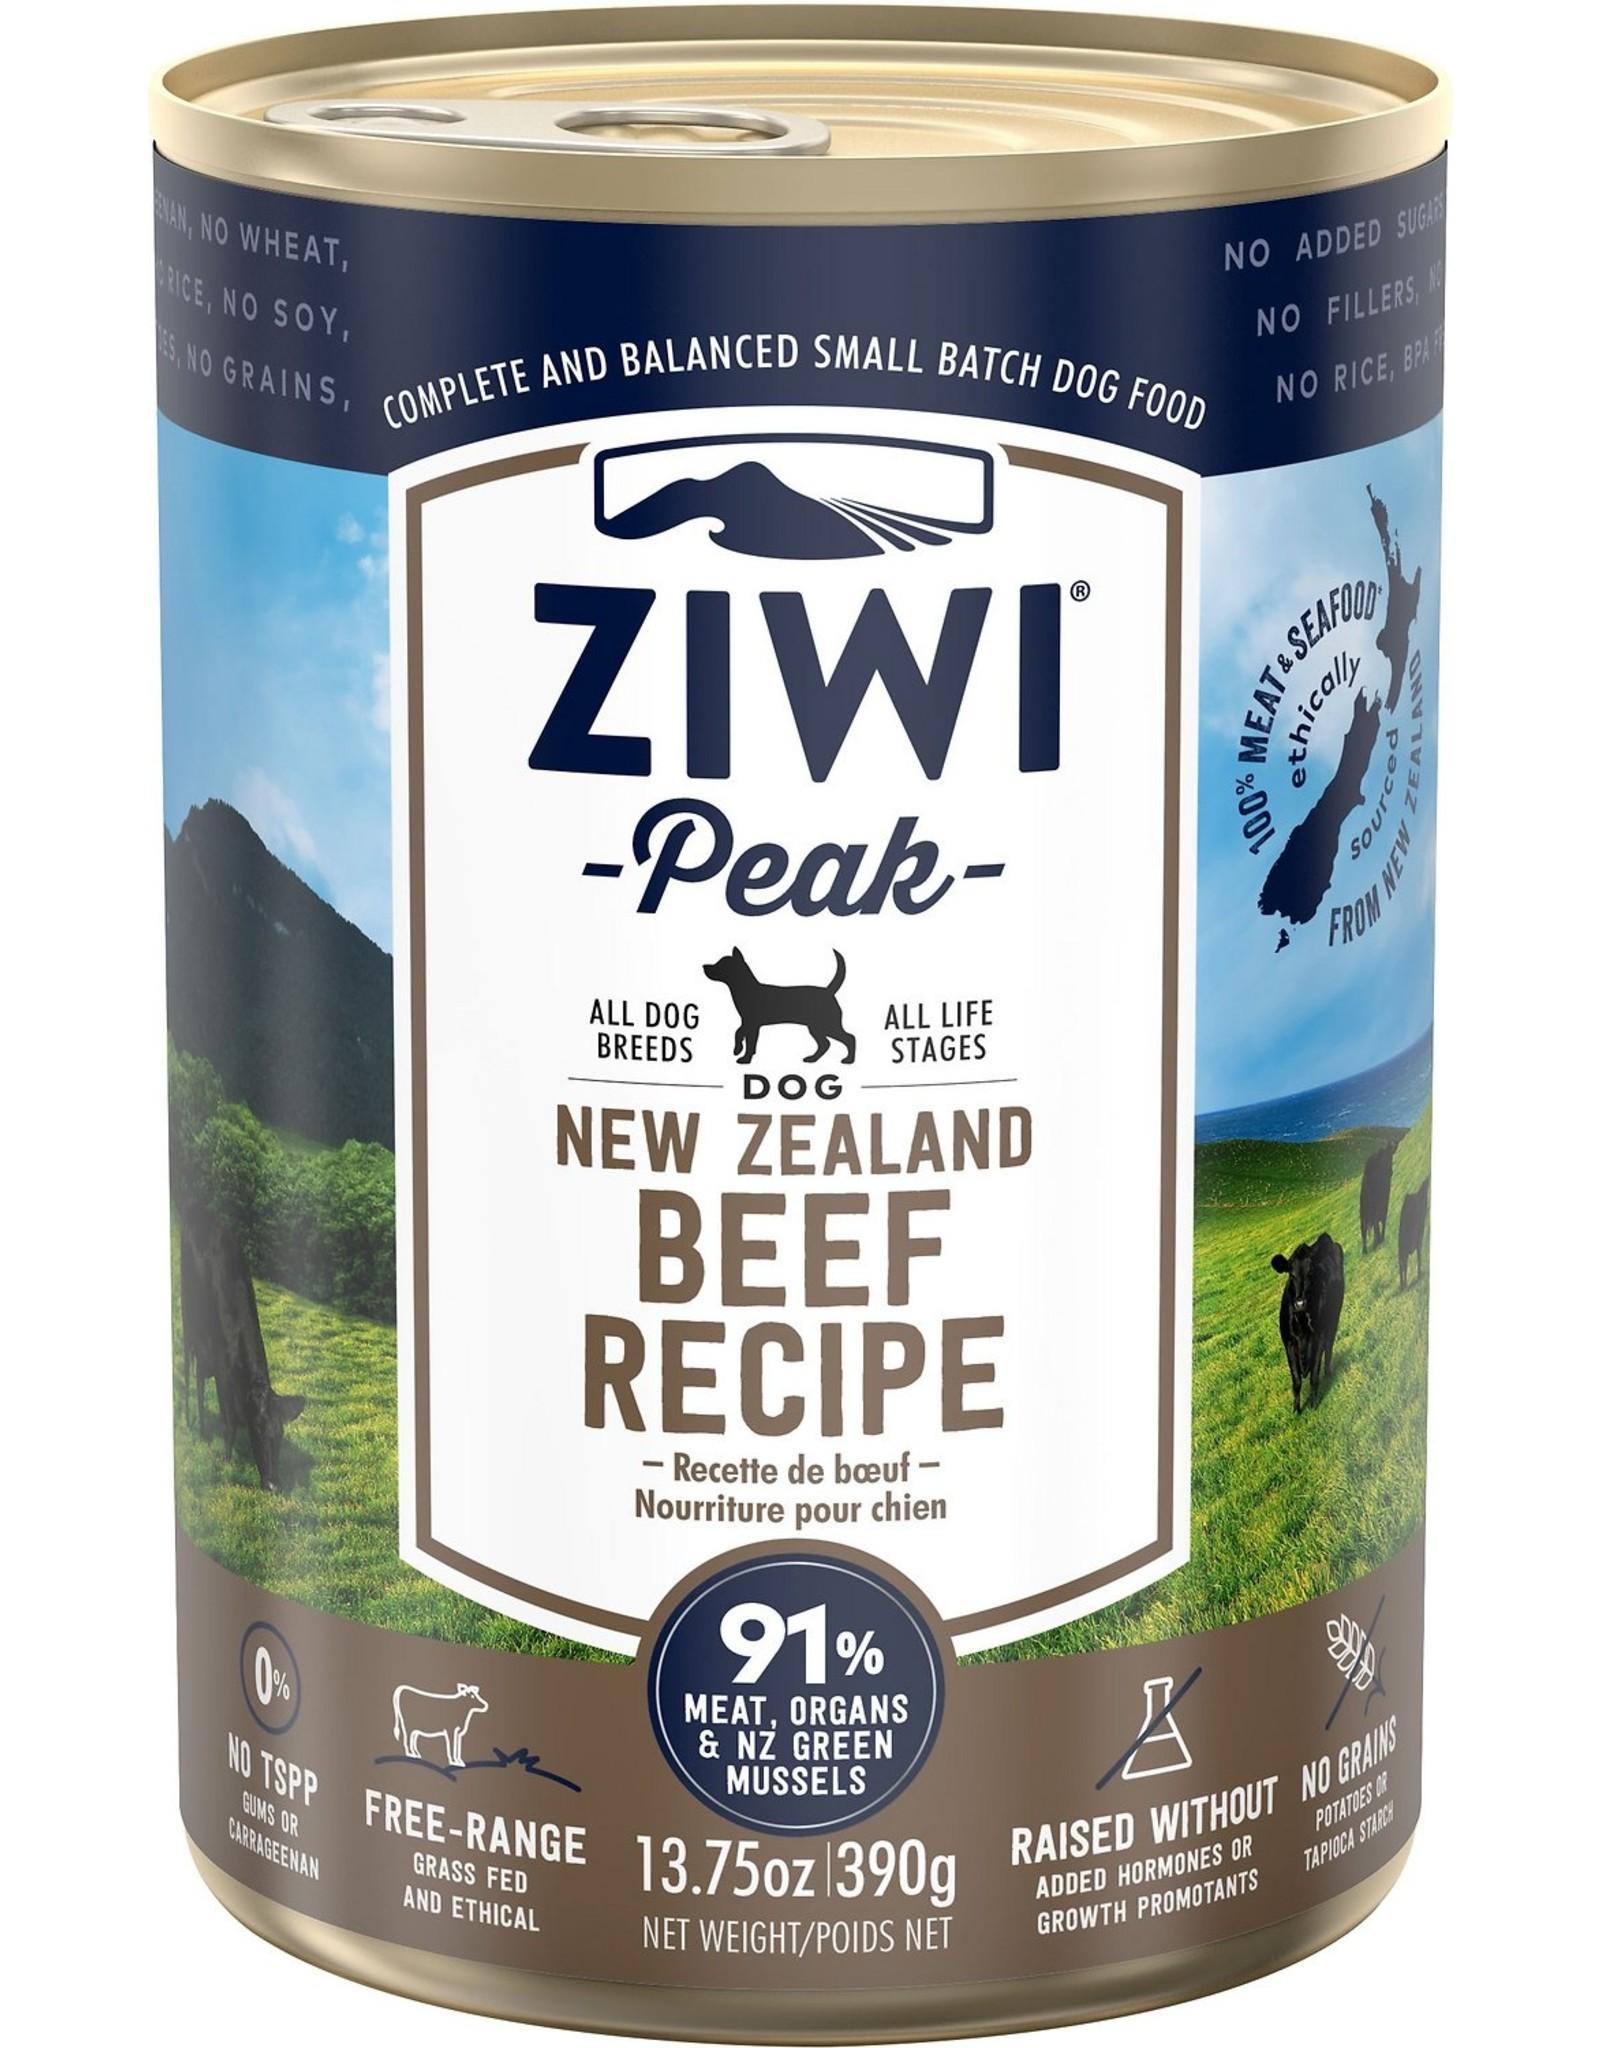 Ziwi Peak Ziwi Peak Beef Recipe for Dogs 13.75oz